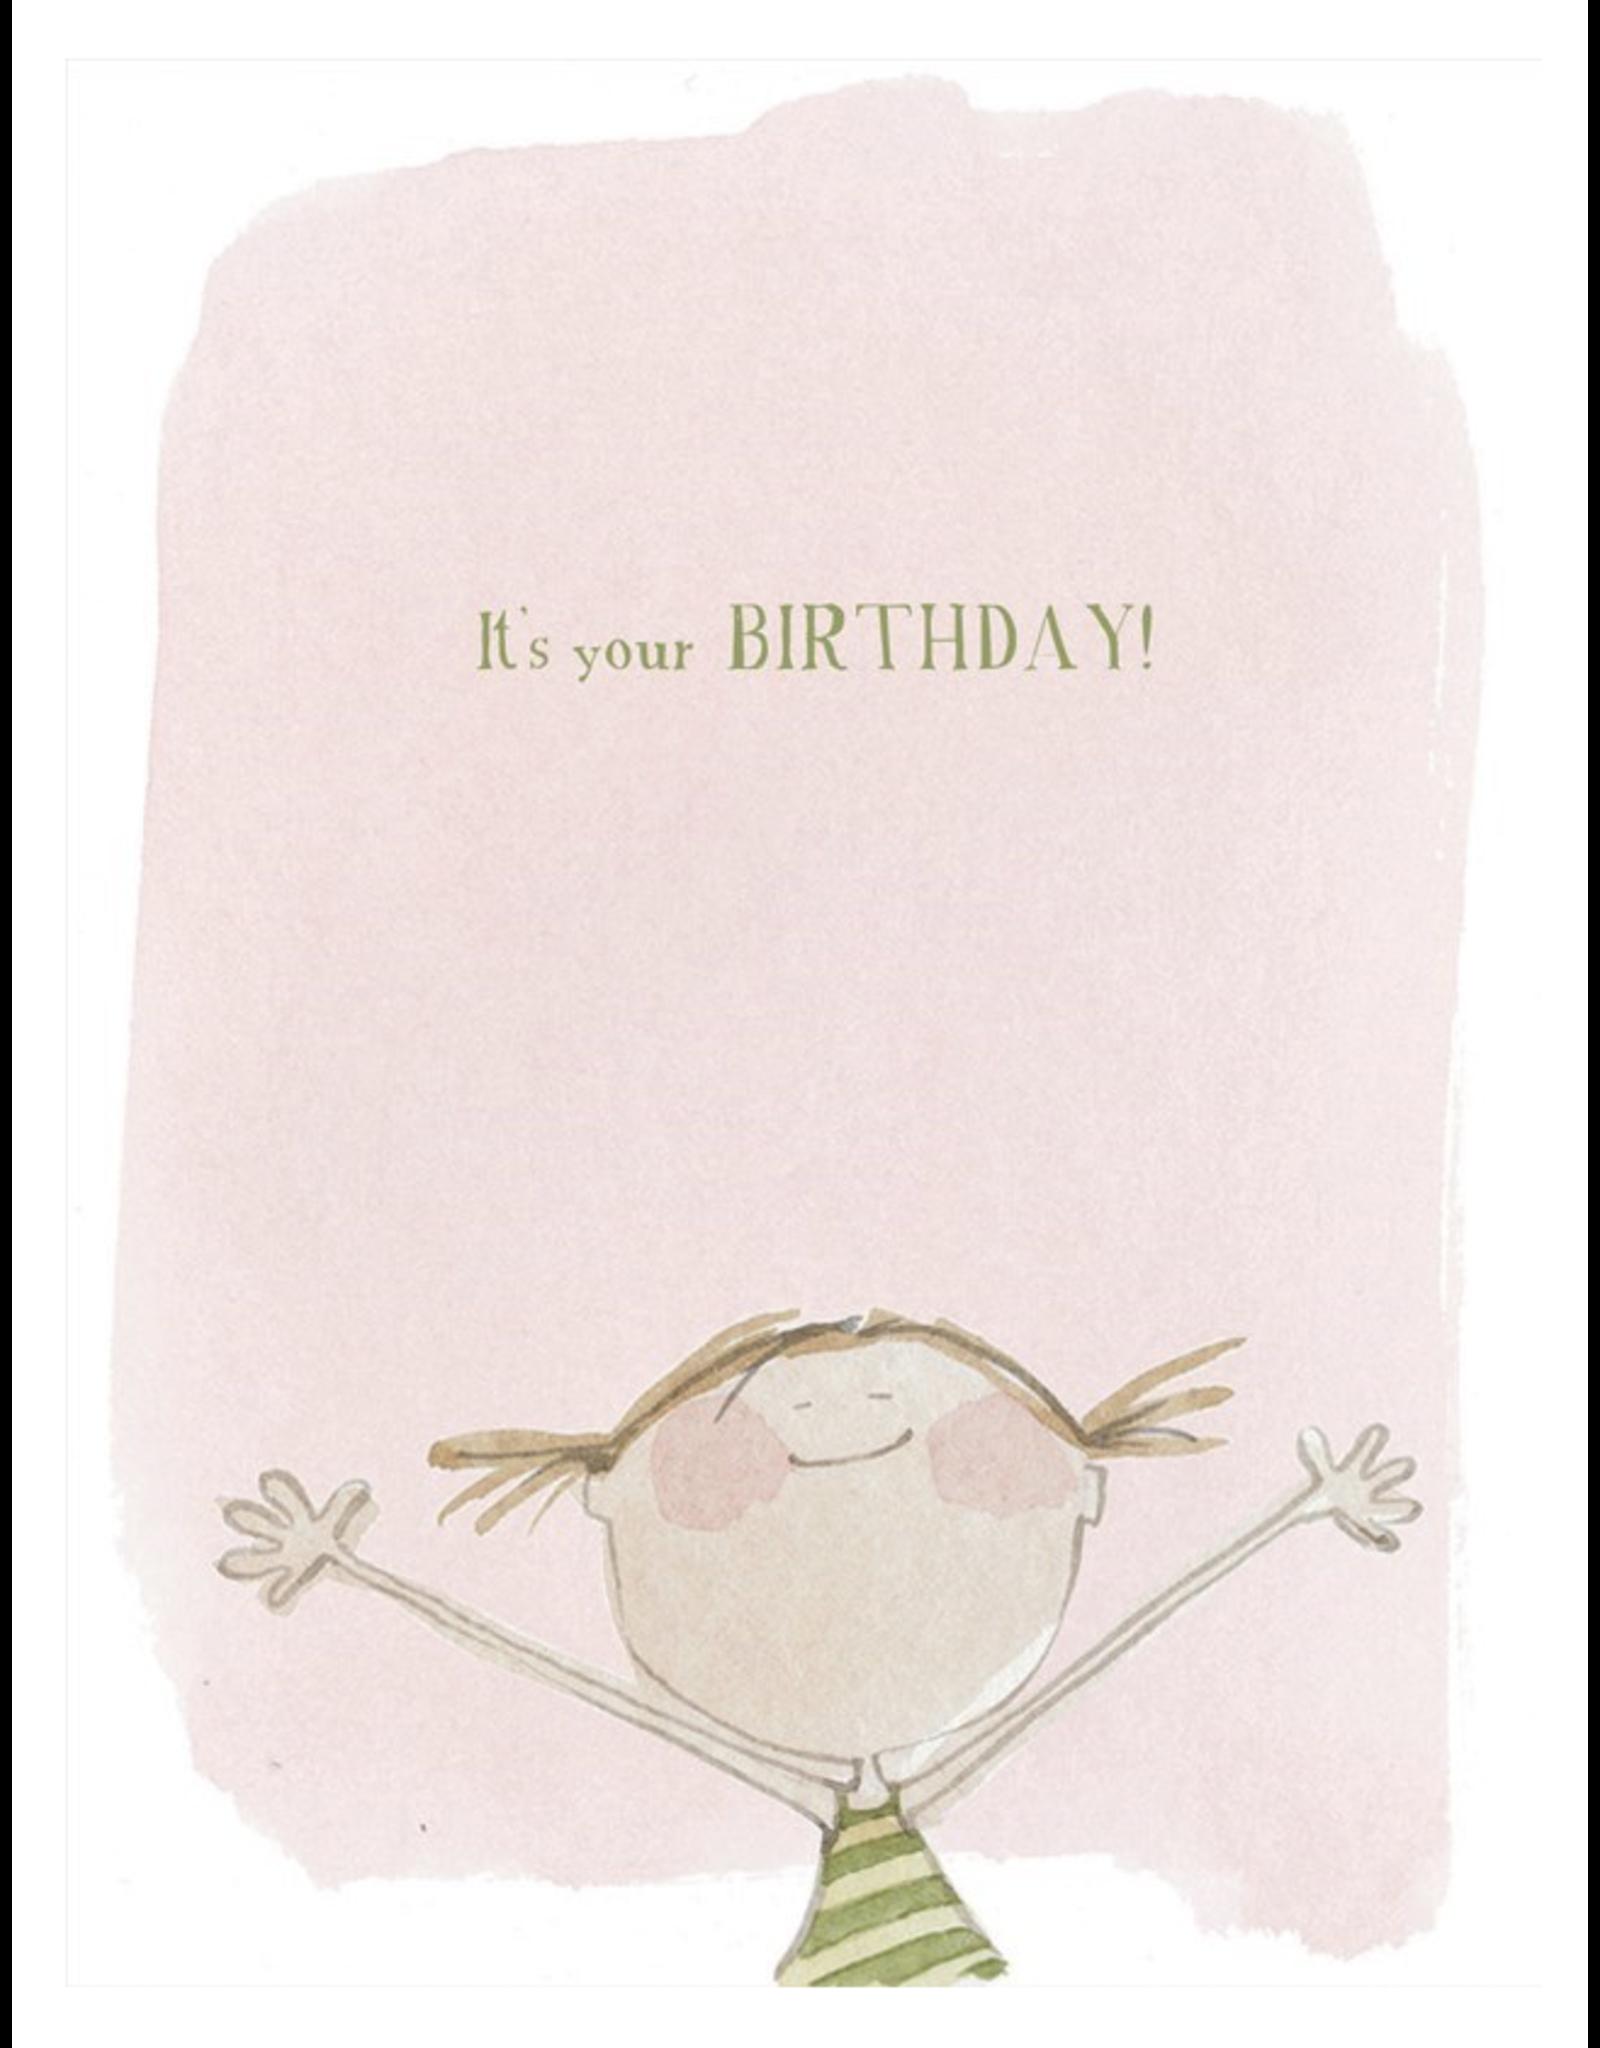 Birthday - It's Your Birthday!